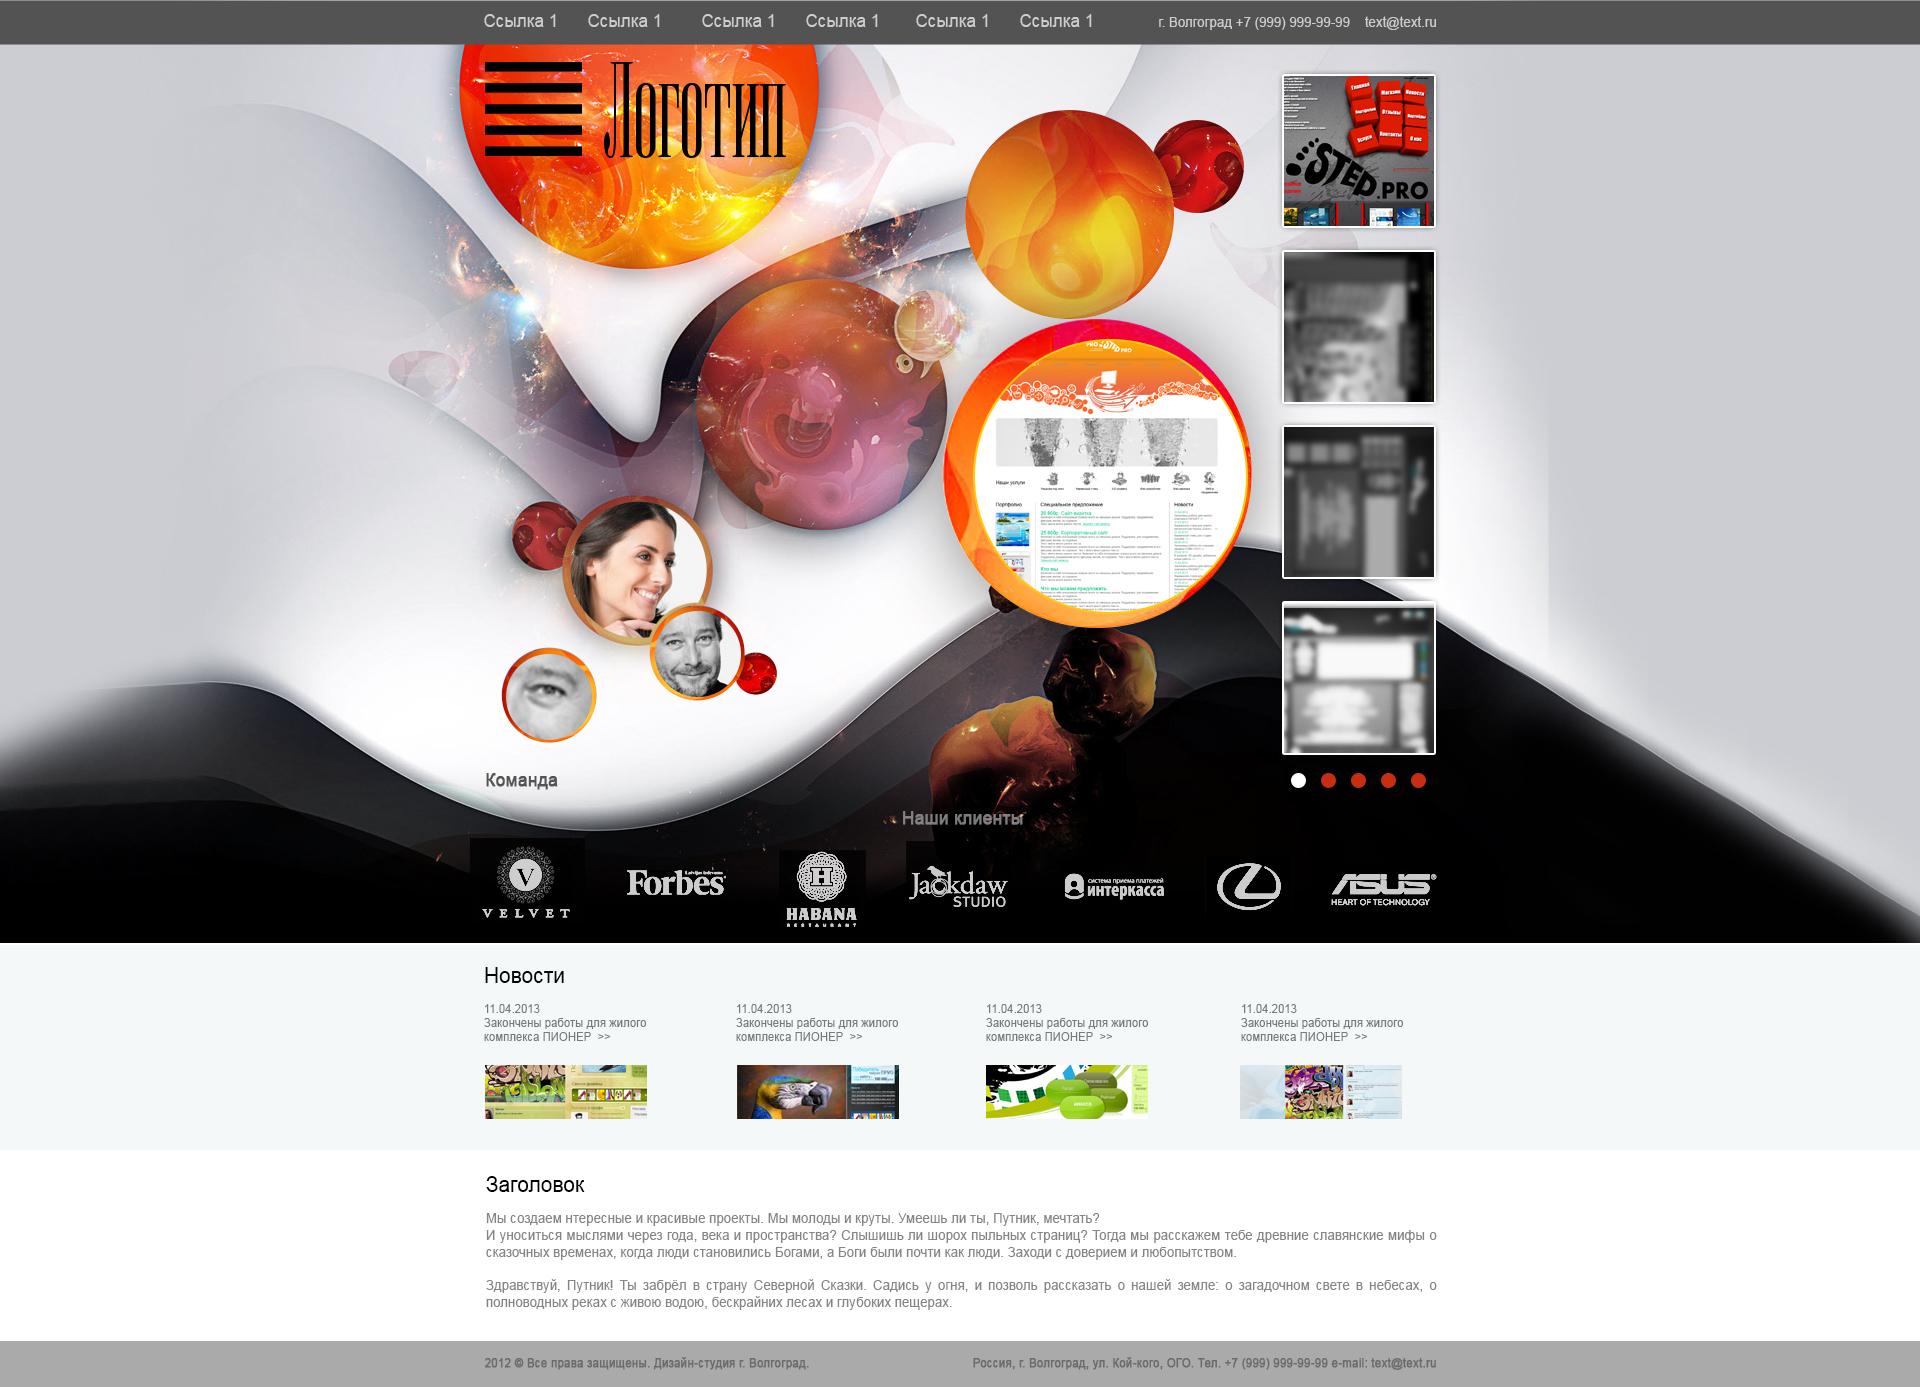 Заказ создания сайта или интернет магазина на тему web-дизайн, jqueryшаблоны, на основании шаблона 29268